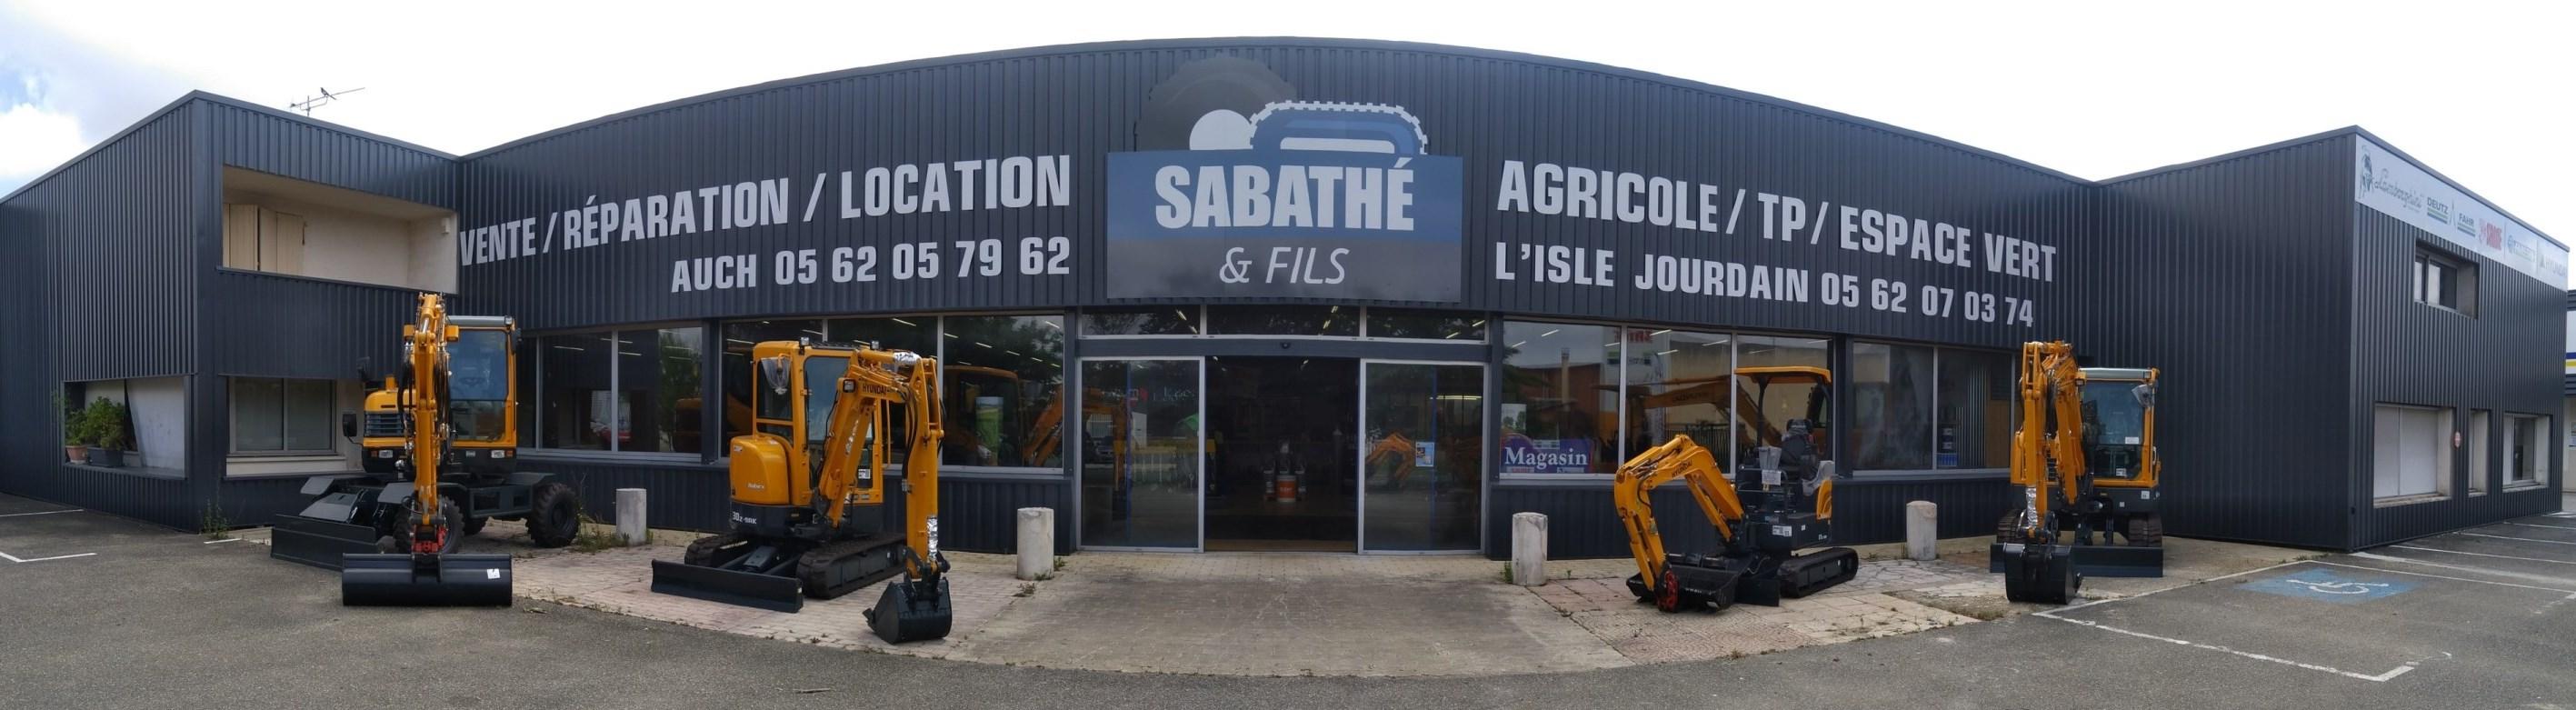 Sabathe & Fils